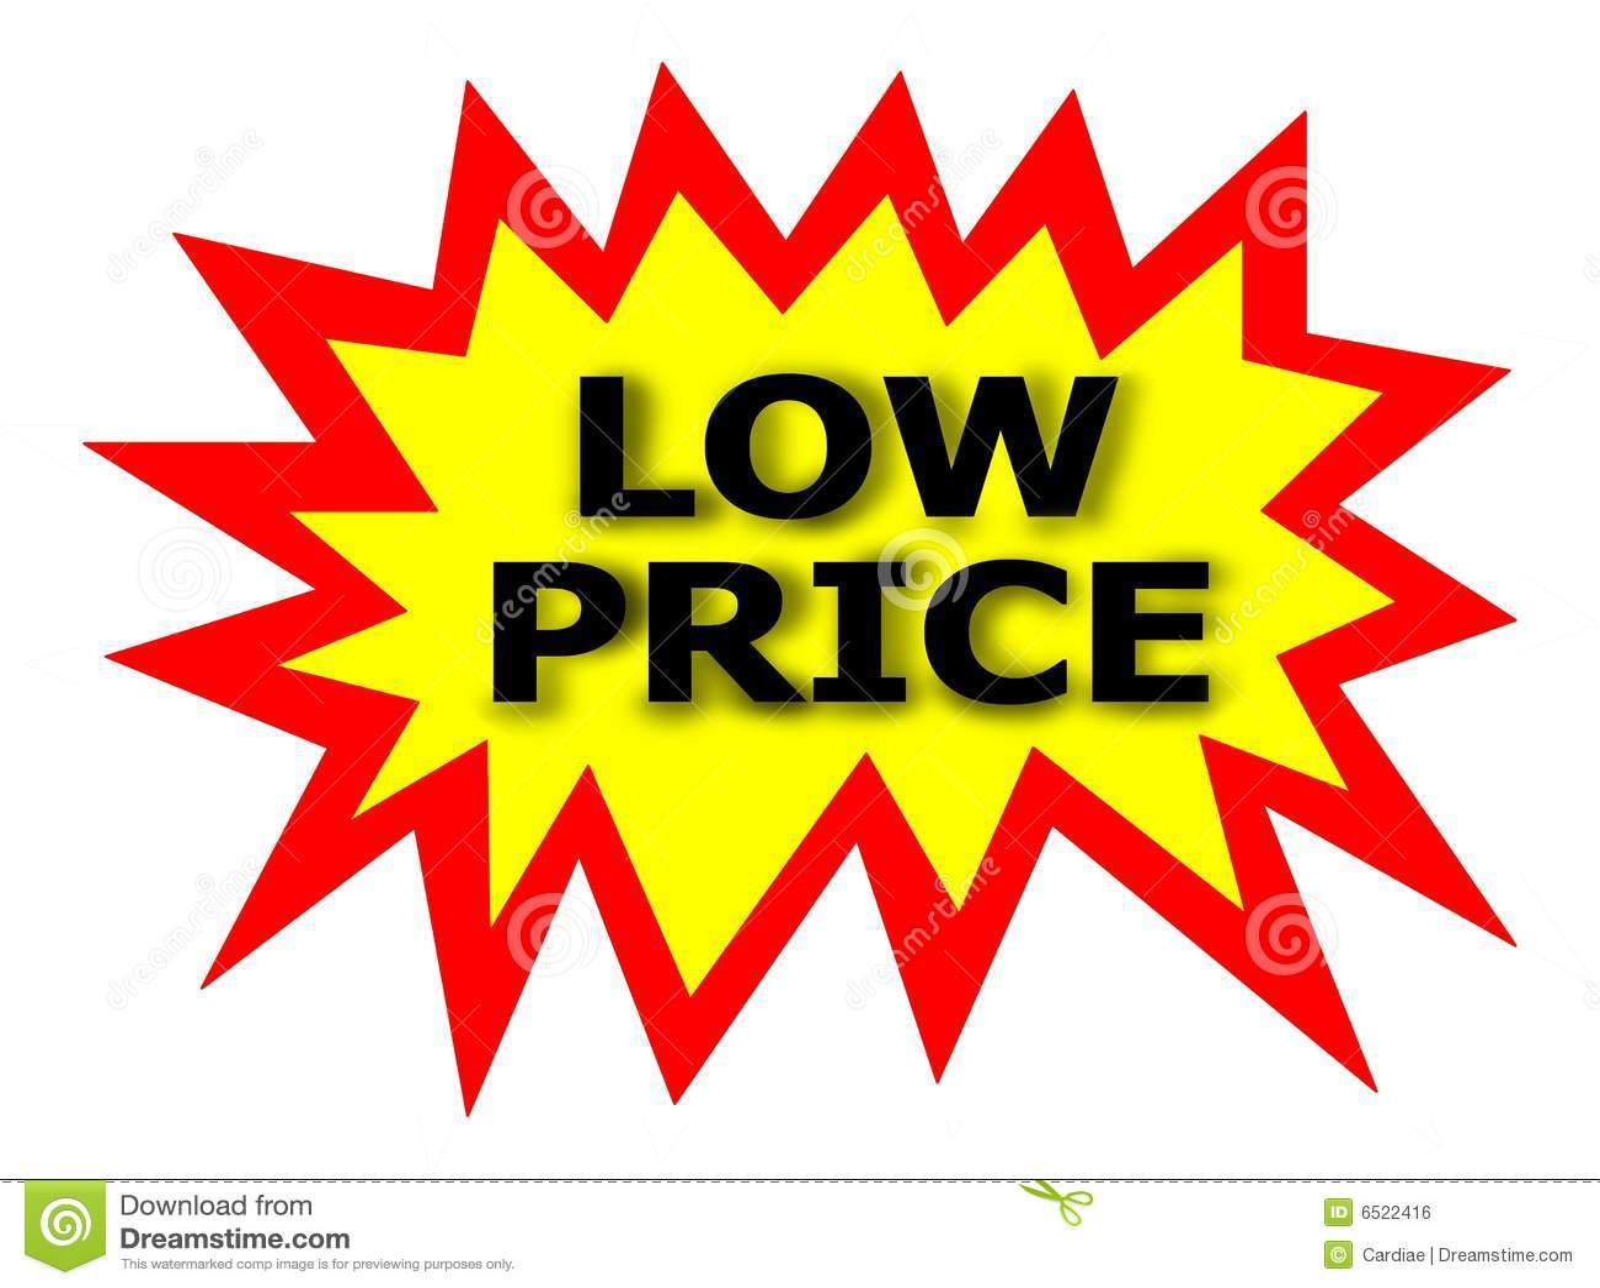 LOW PRICE Tag Royalty Free Stock Image - Image: 6522416